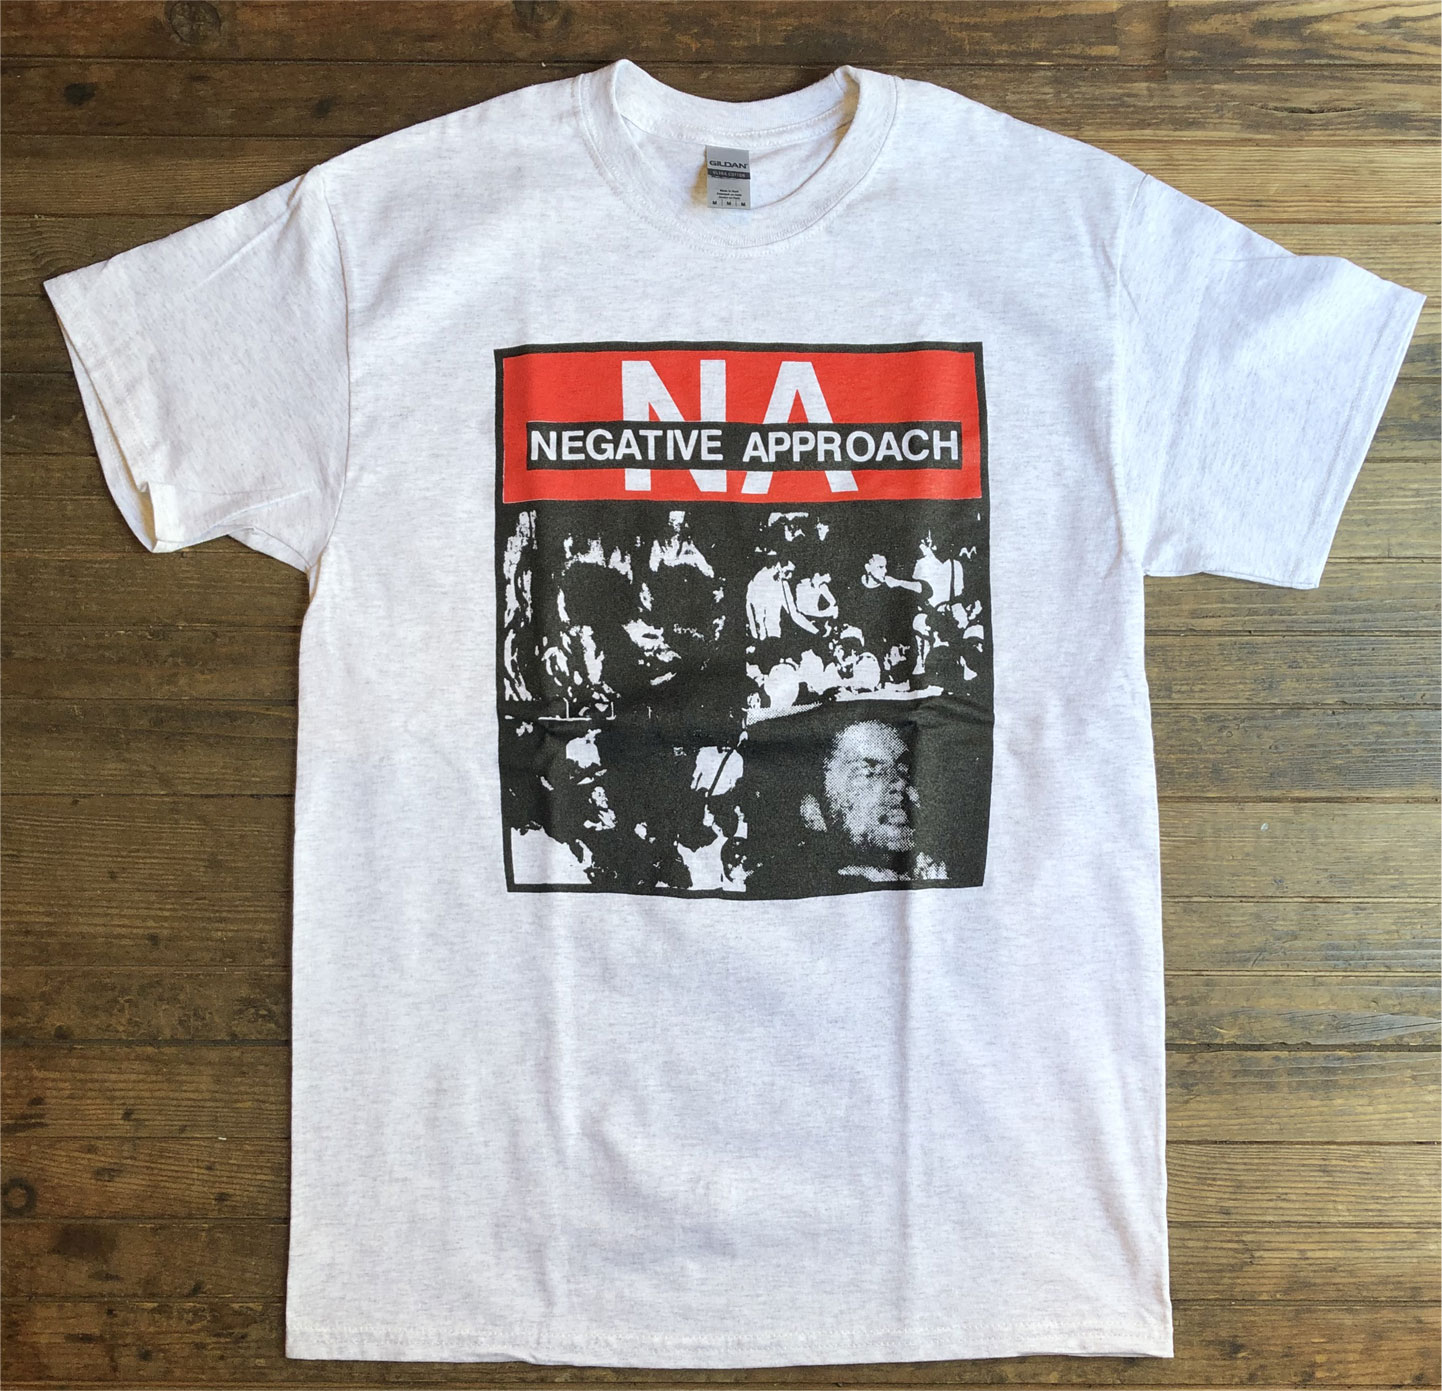 NEGATIVE APPROACH Tシャツ PHOTO 3